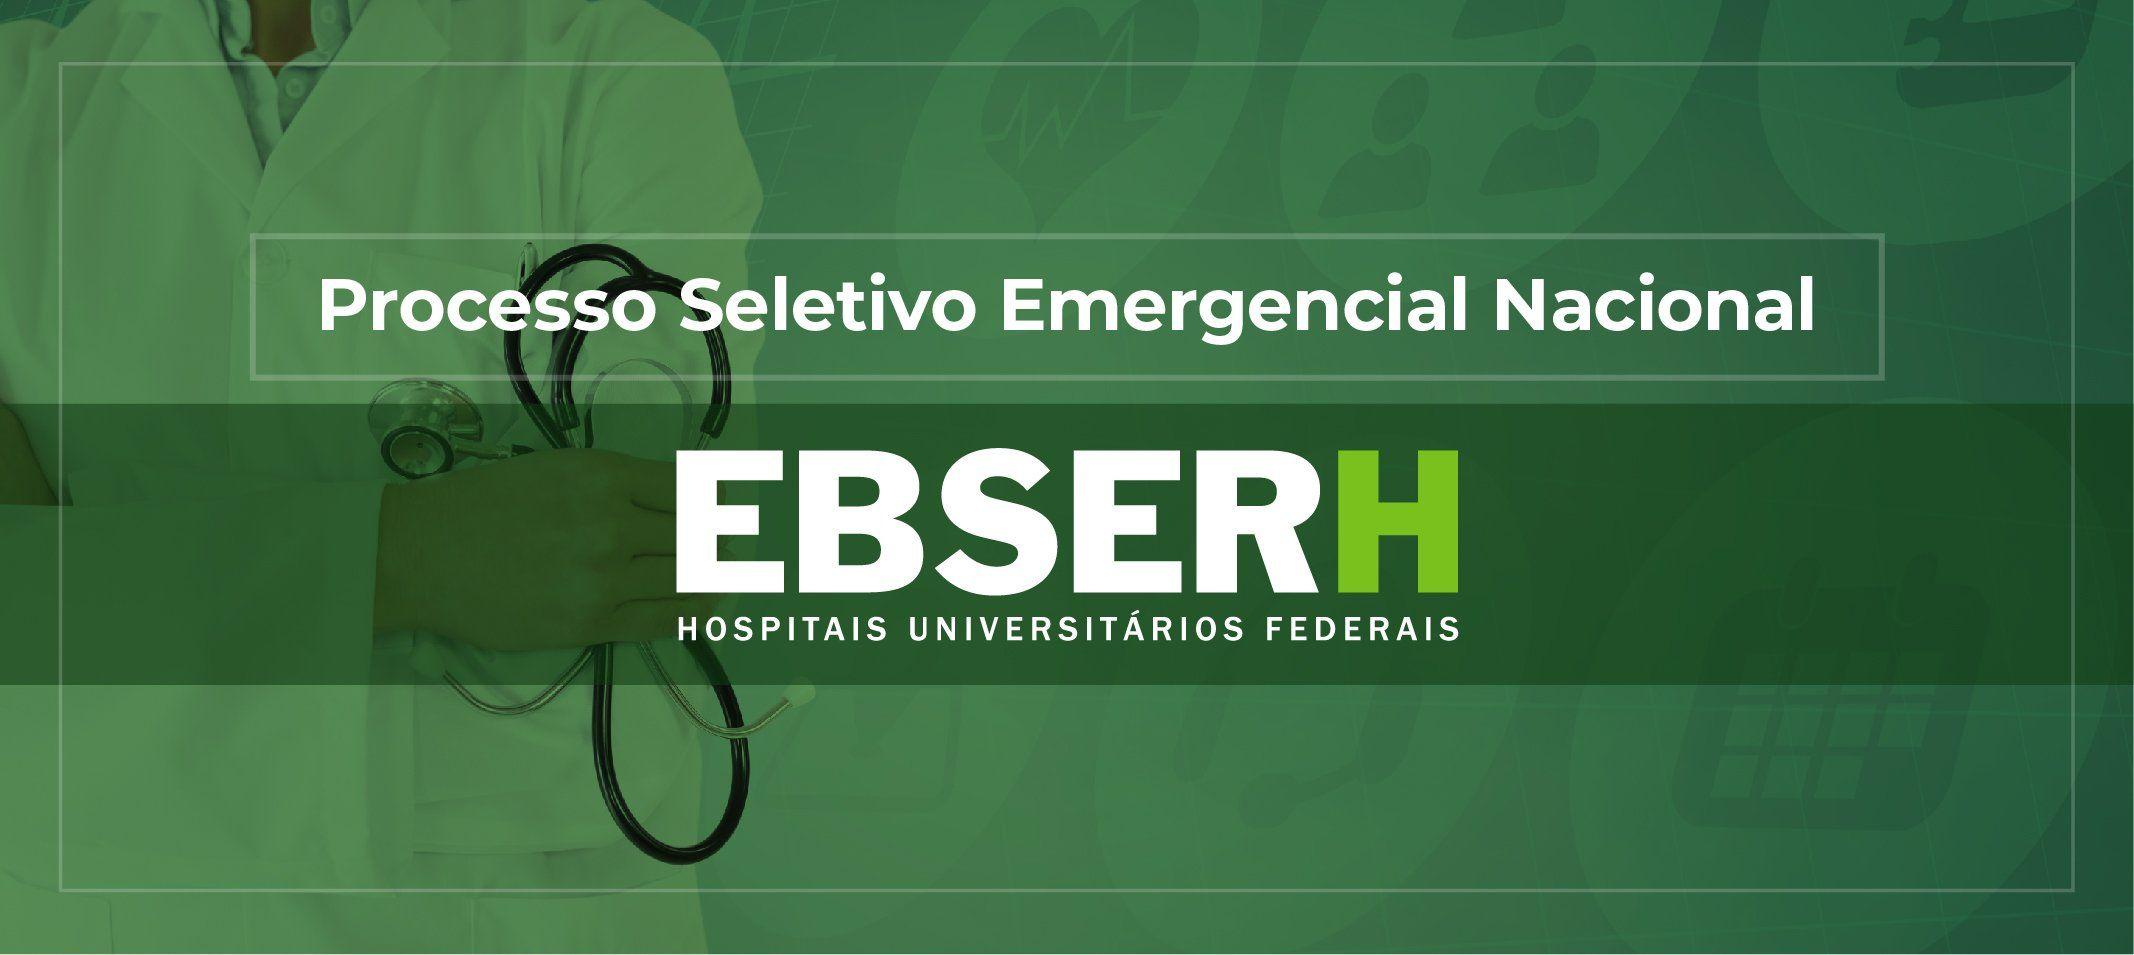 Ebserh realiza processo seletivo emergencial para combater pandemia de covid-19